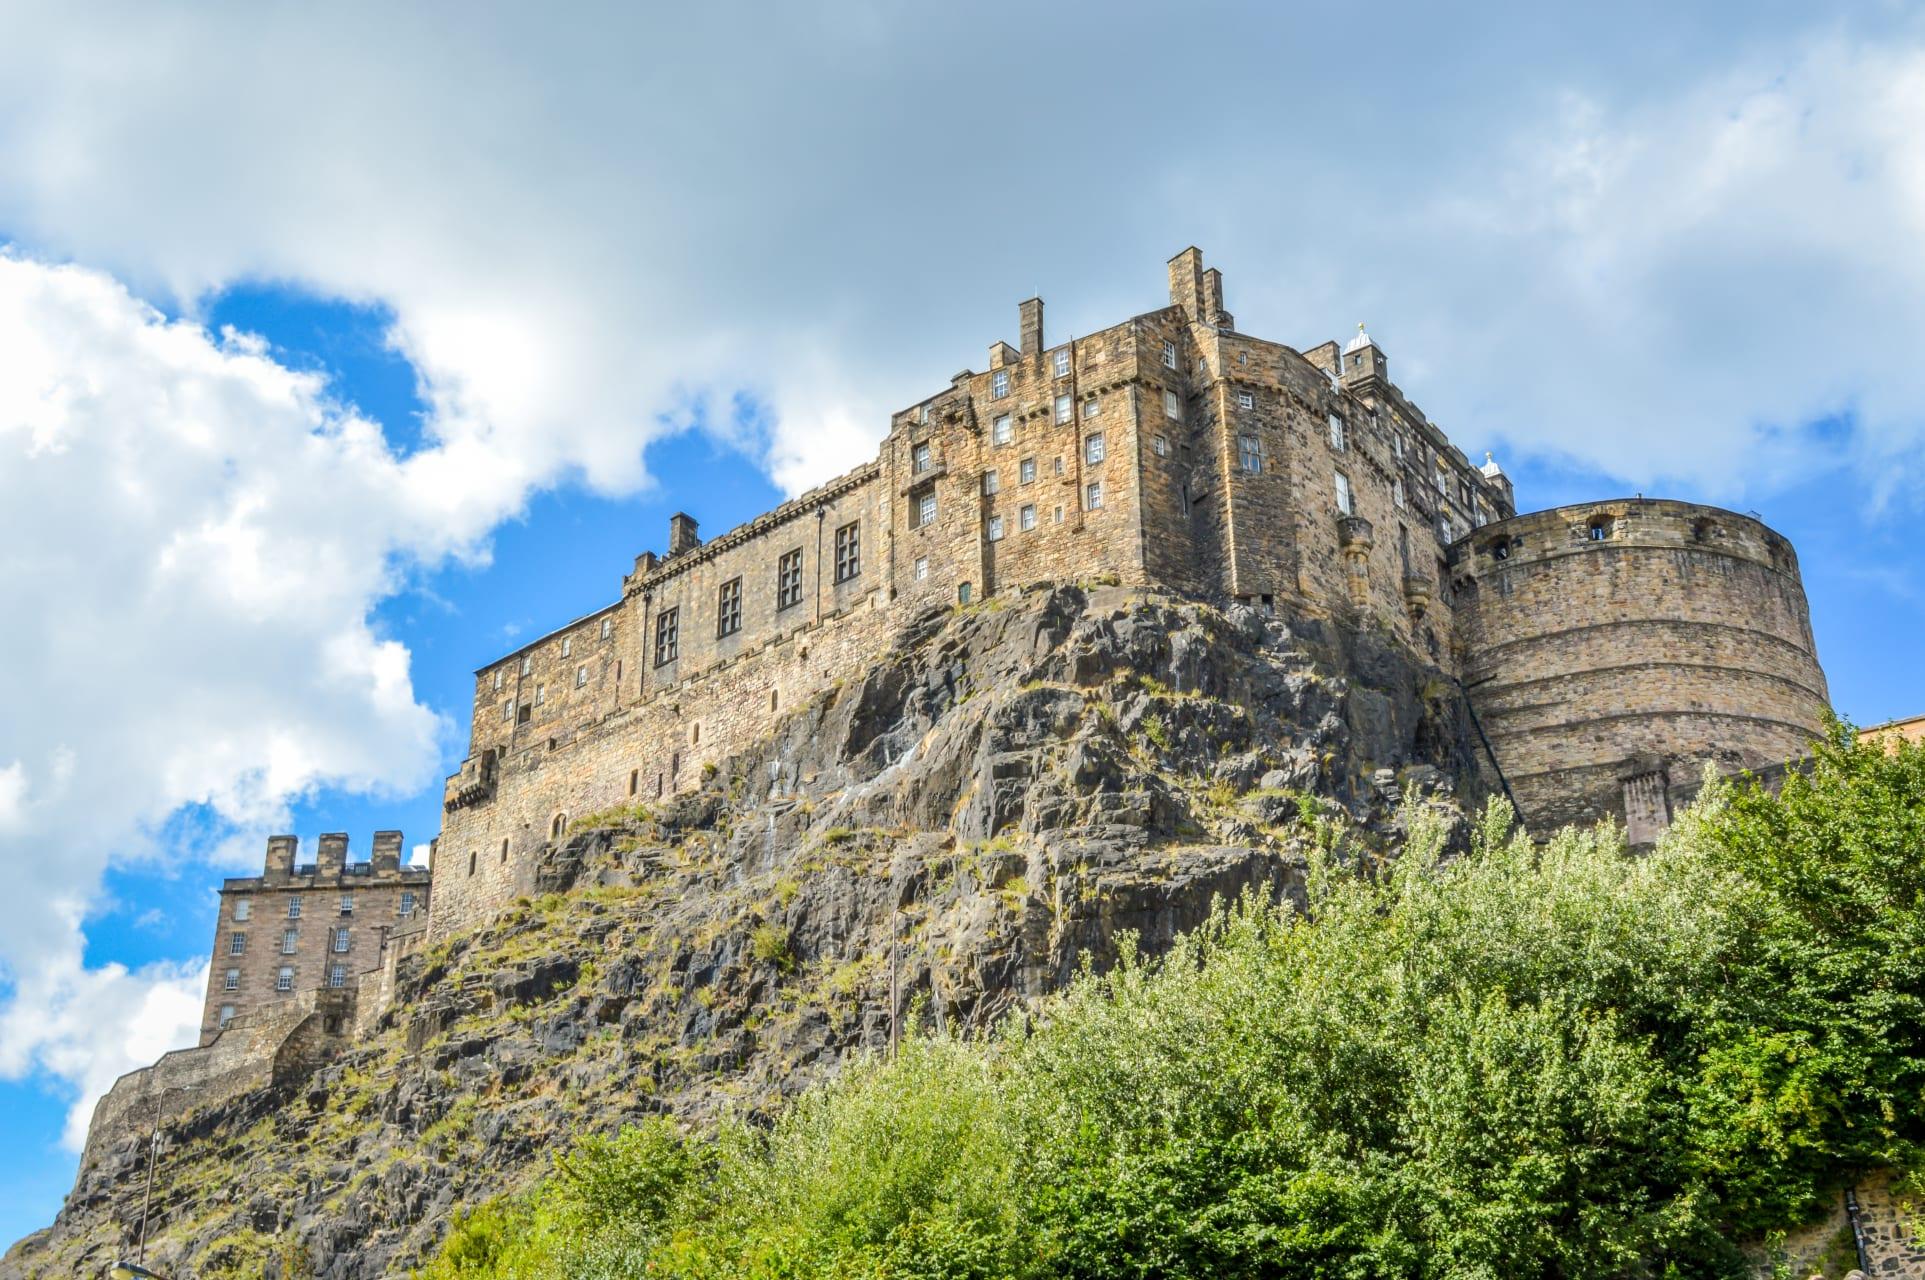 Edinburgh - Edinburgh Castle and more from Grassmarket